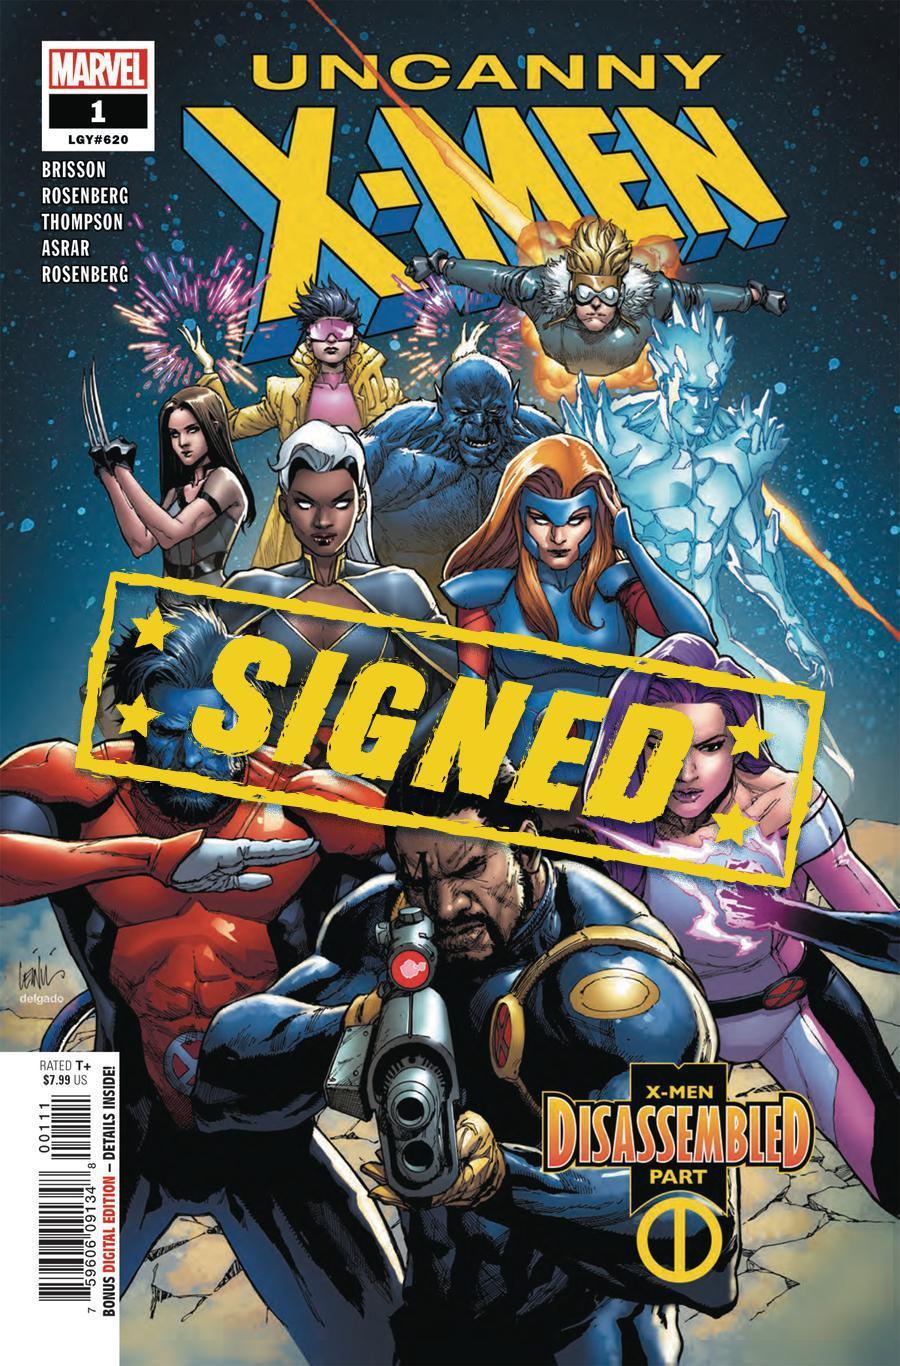 Uncanny X-Men Vol 5 #1 Cover W Regular Leinil Francis Yu Cover Signed By Kelly Thompson